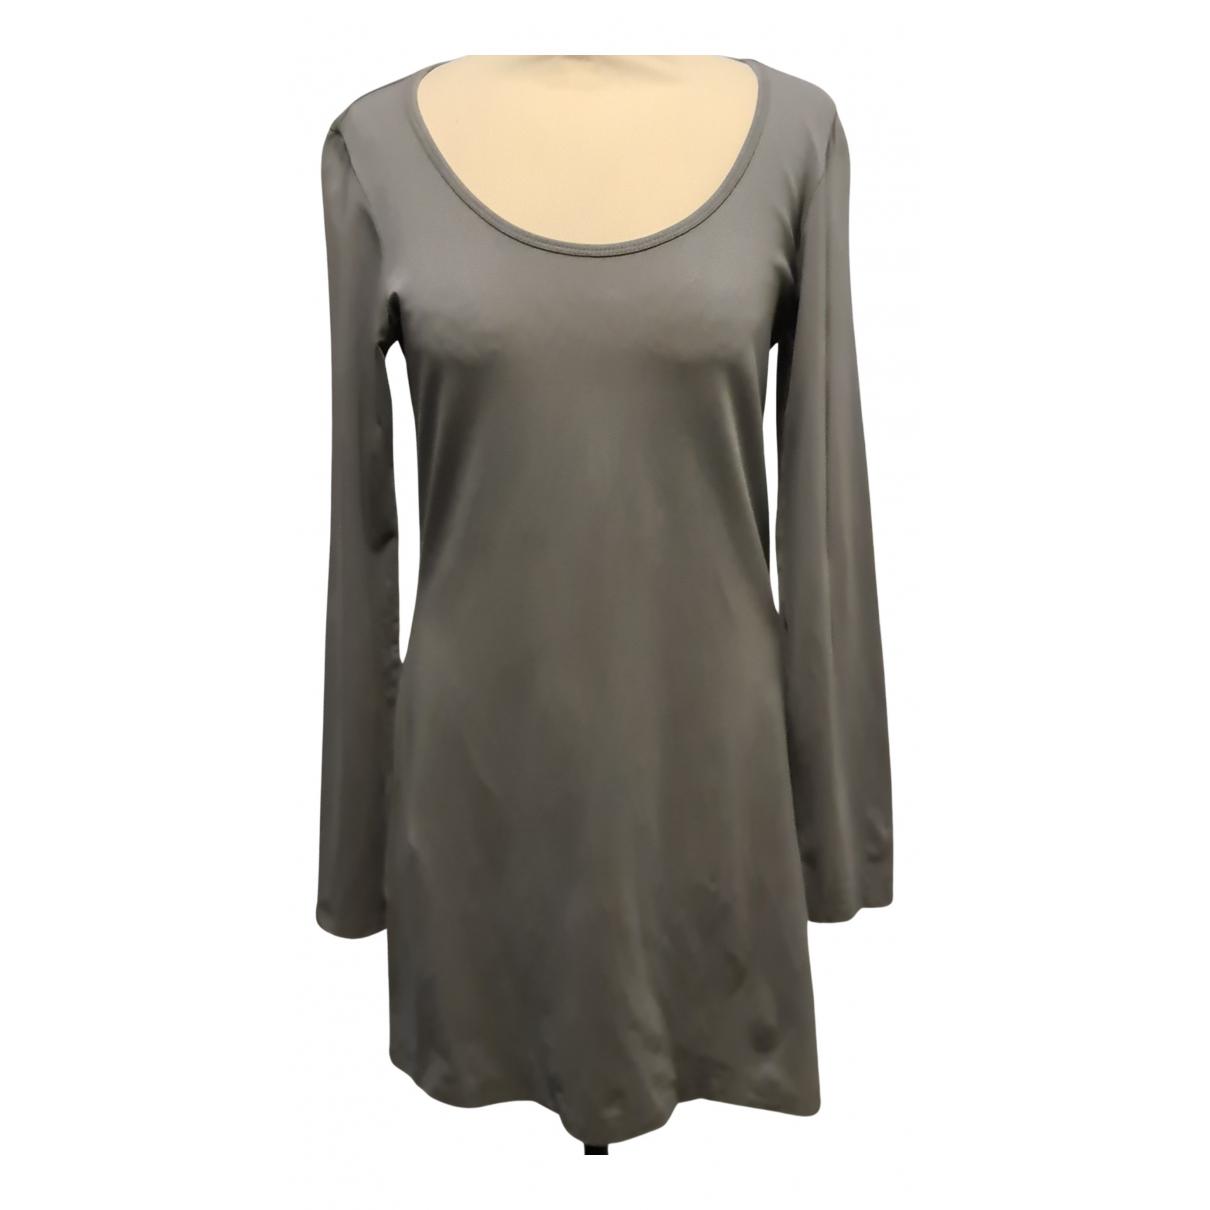 Esprit N Grey Cotton dress for Women XL International